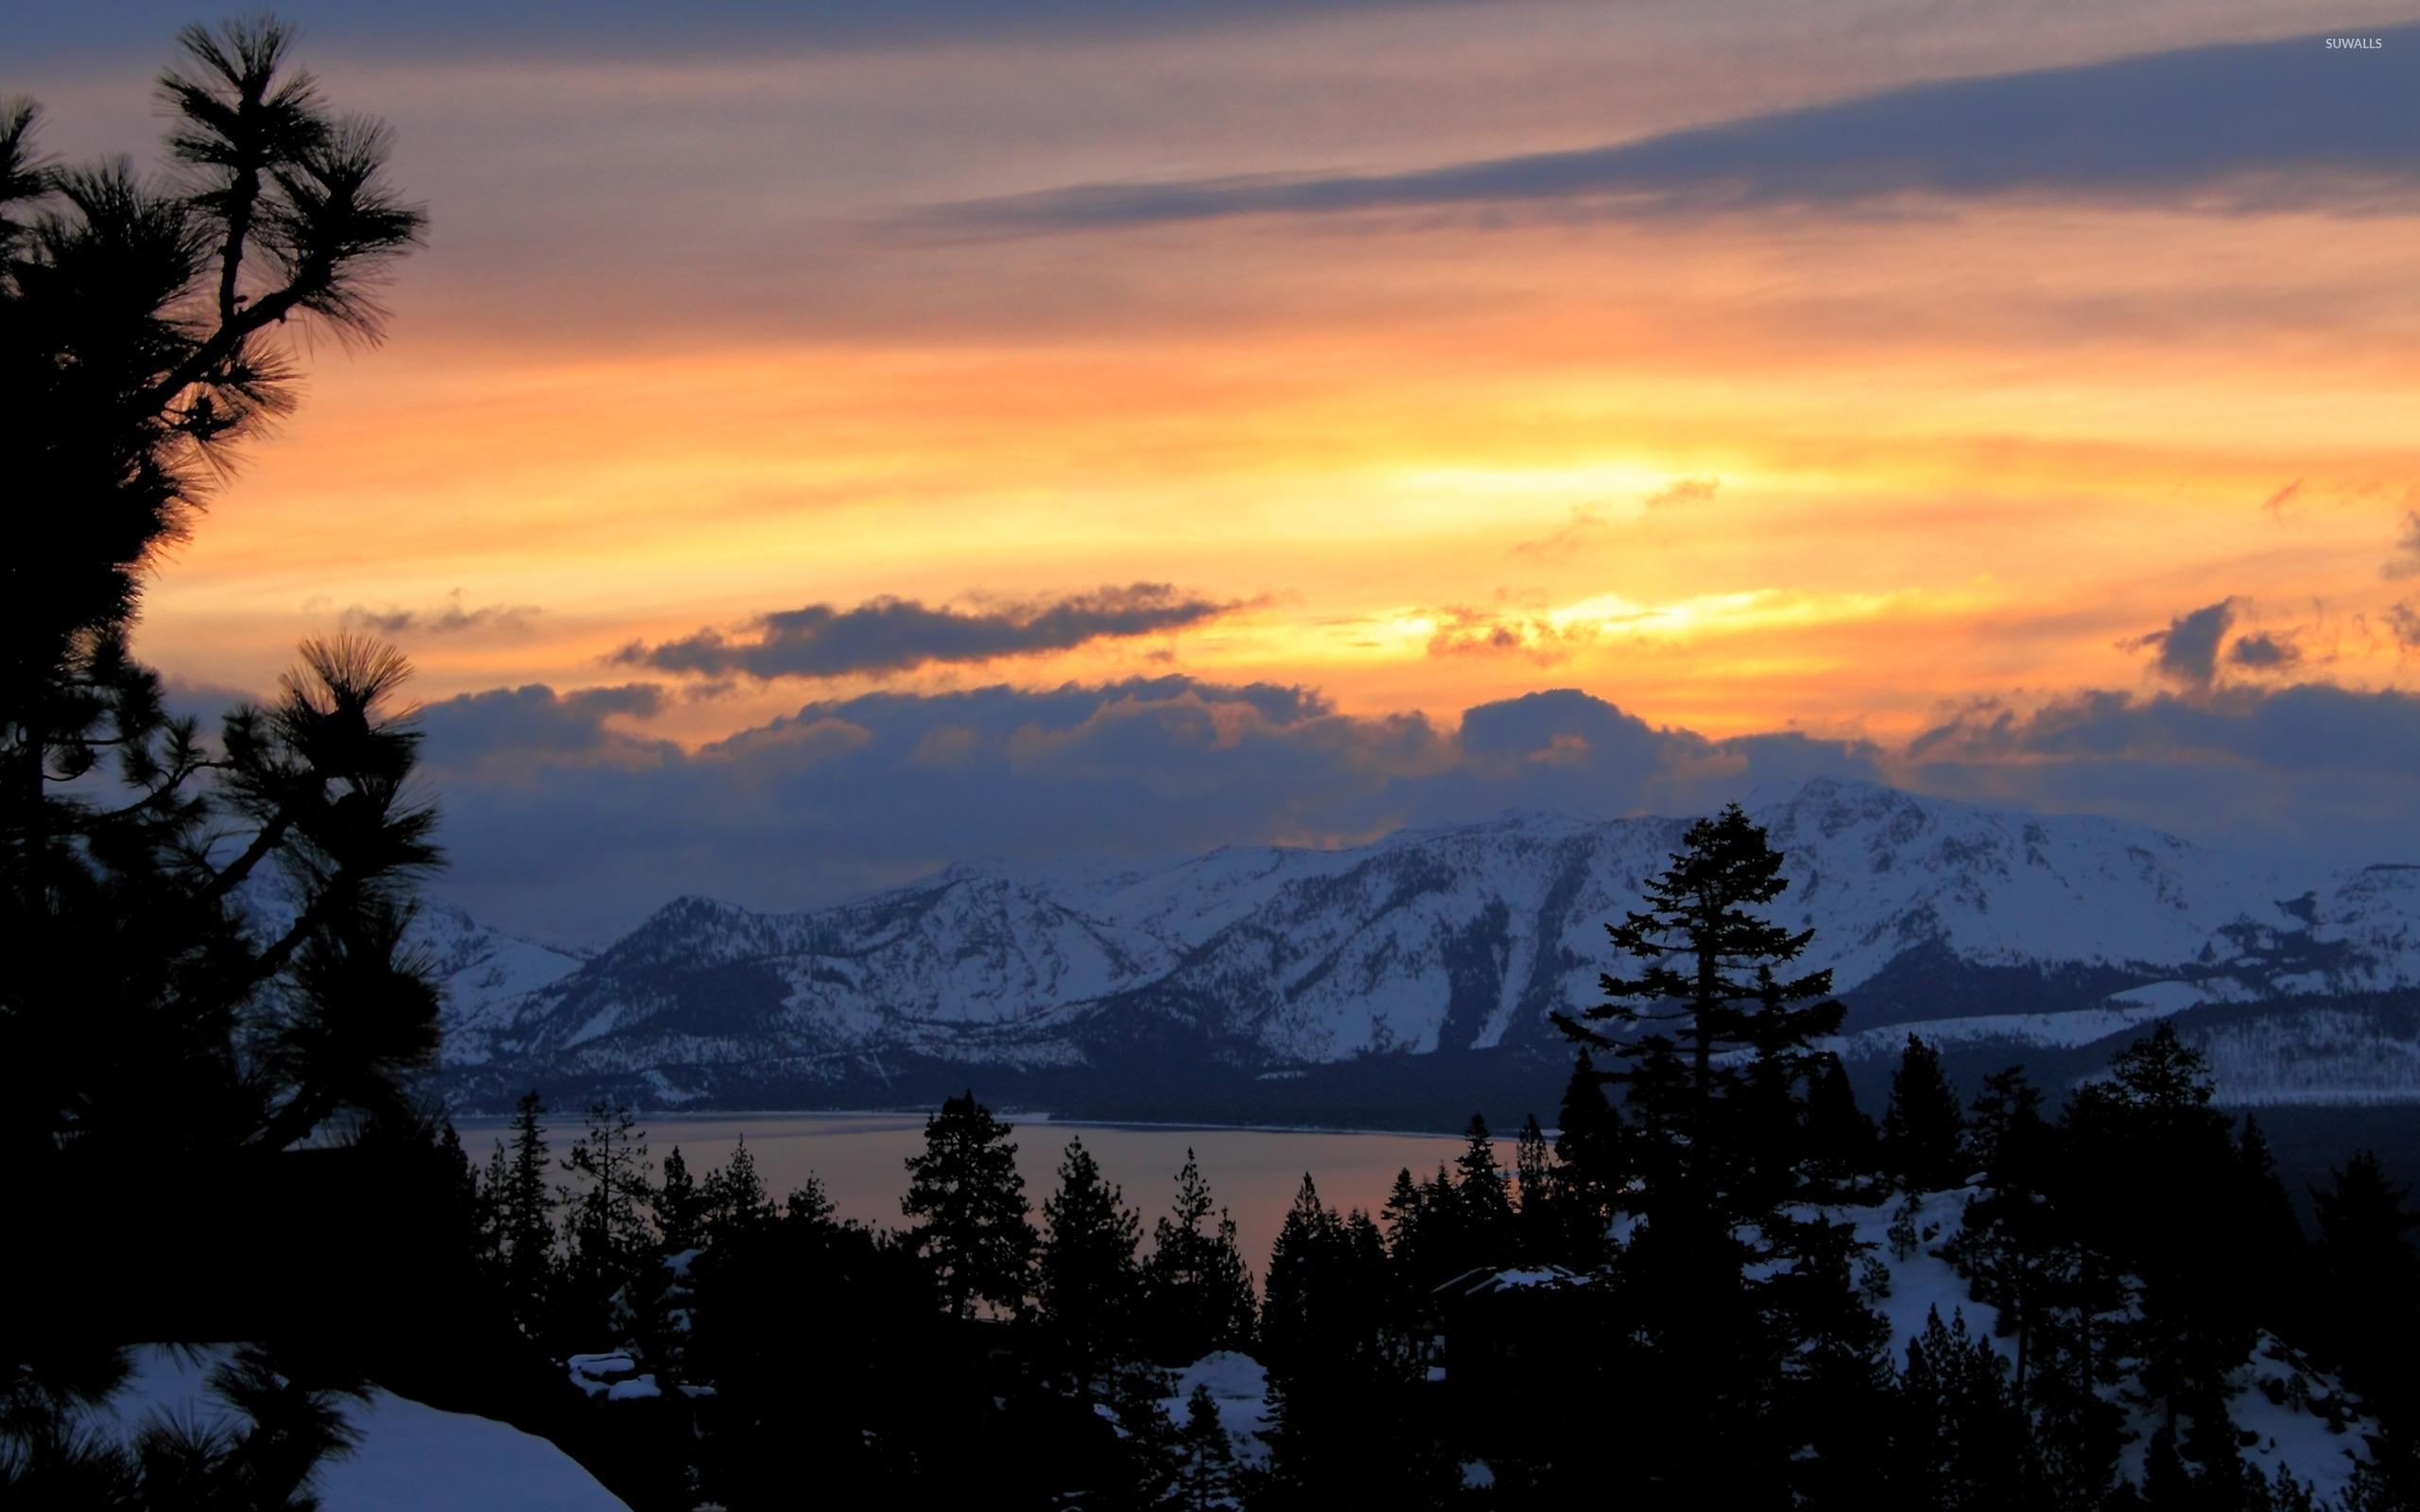 Great Wallpaper Mountain Dark - heavy-dark-clouds-upon-the-snowy-mountain-peaks-52337-2560x1600  Graphic_82683.jpg